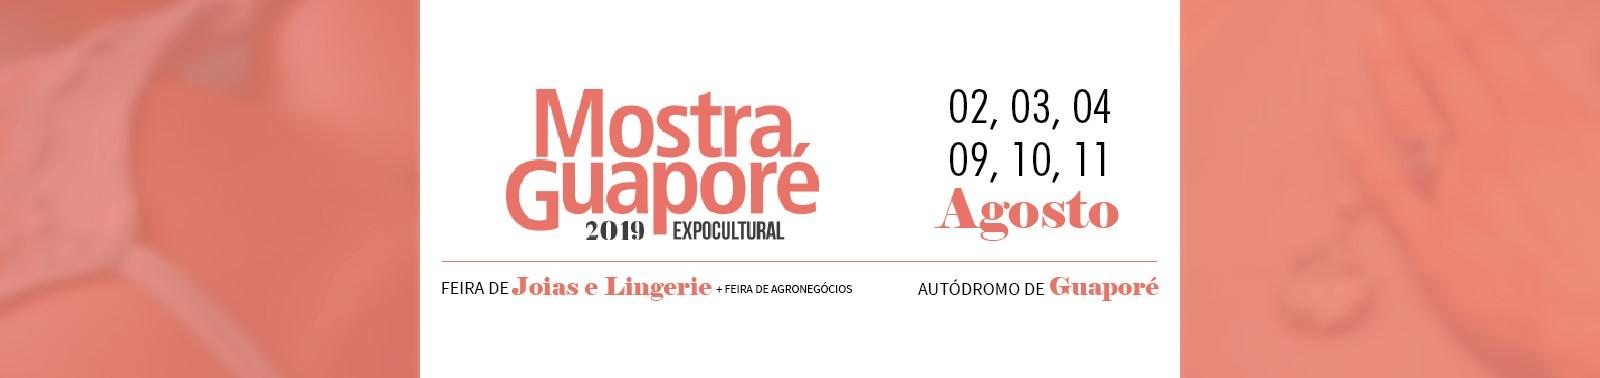 Banner 6 - Mostra Guaporé 2019